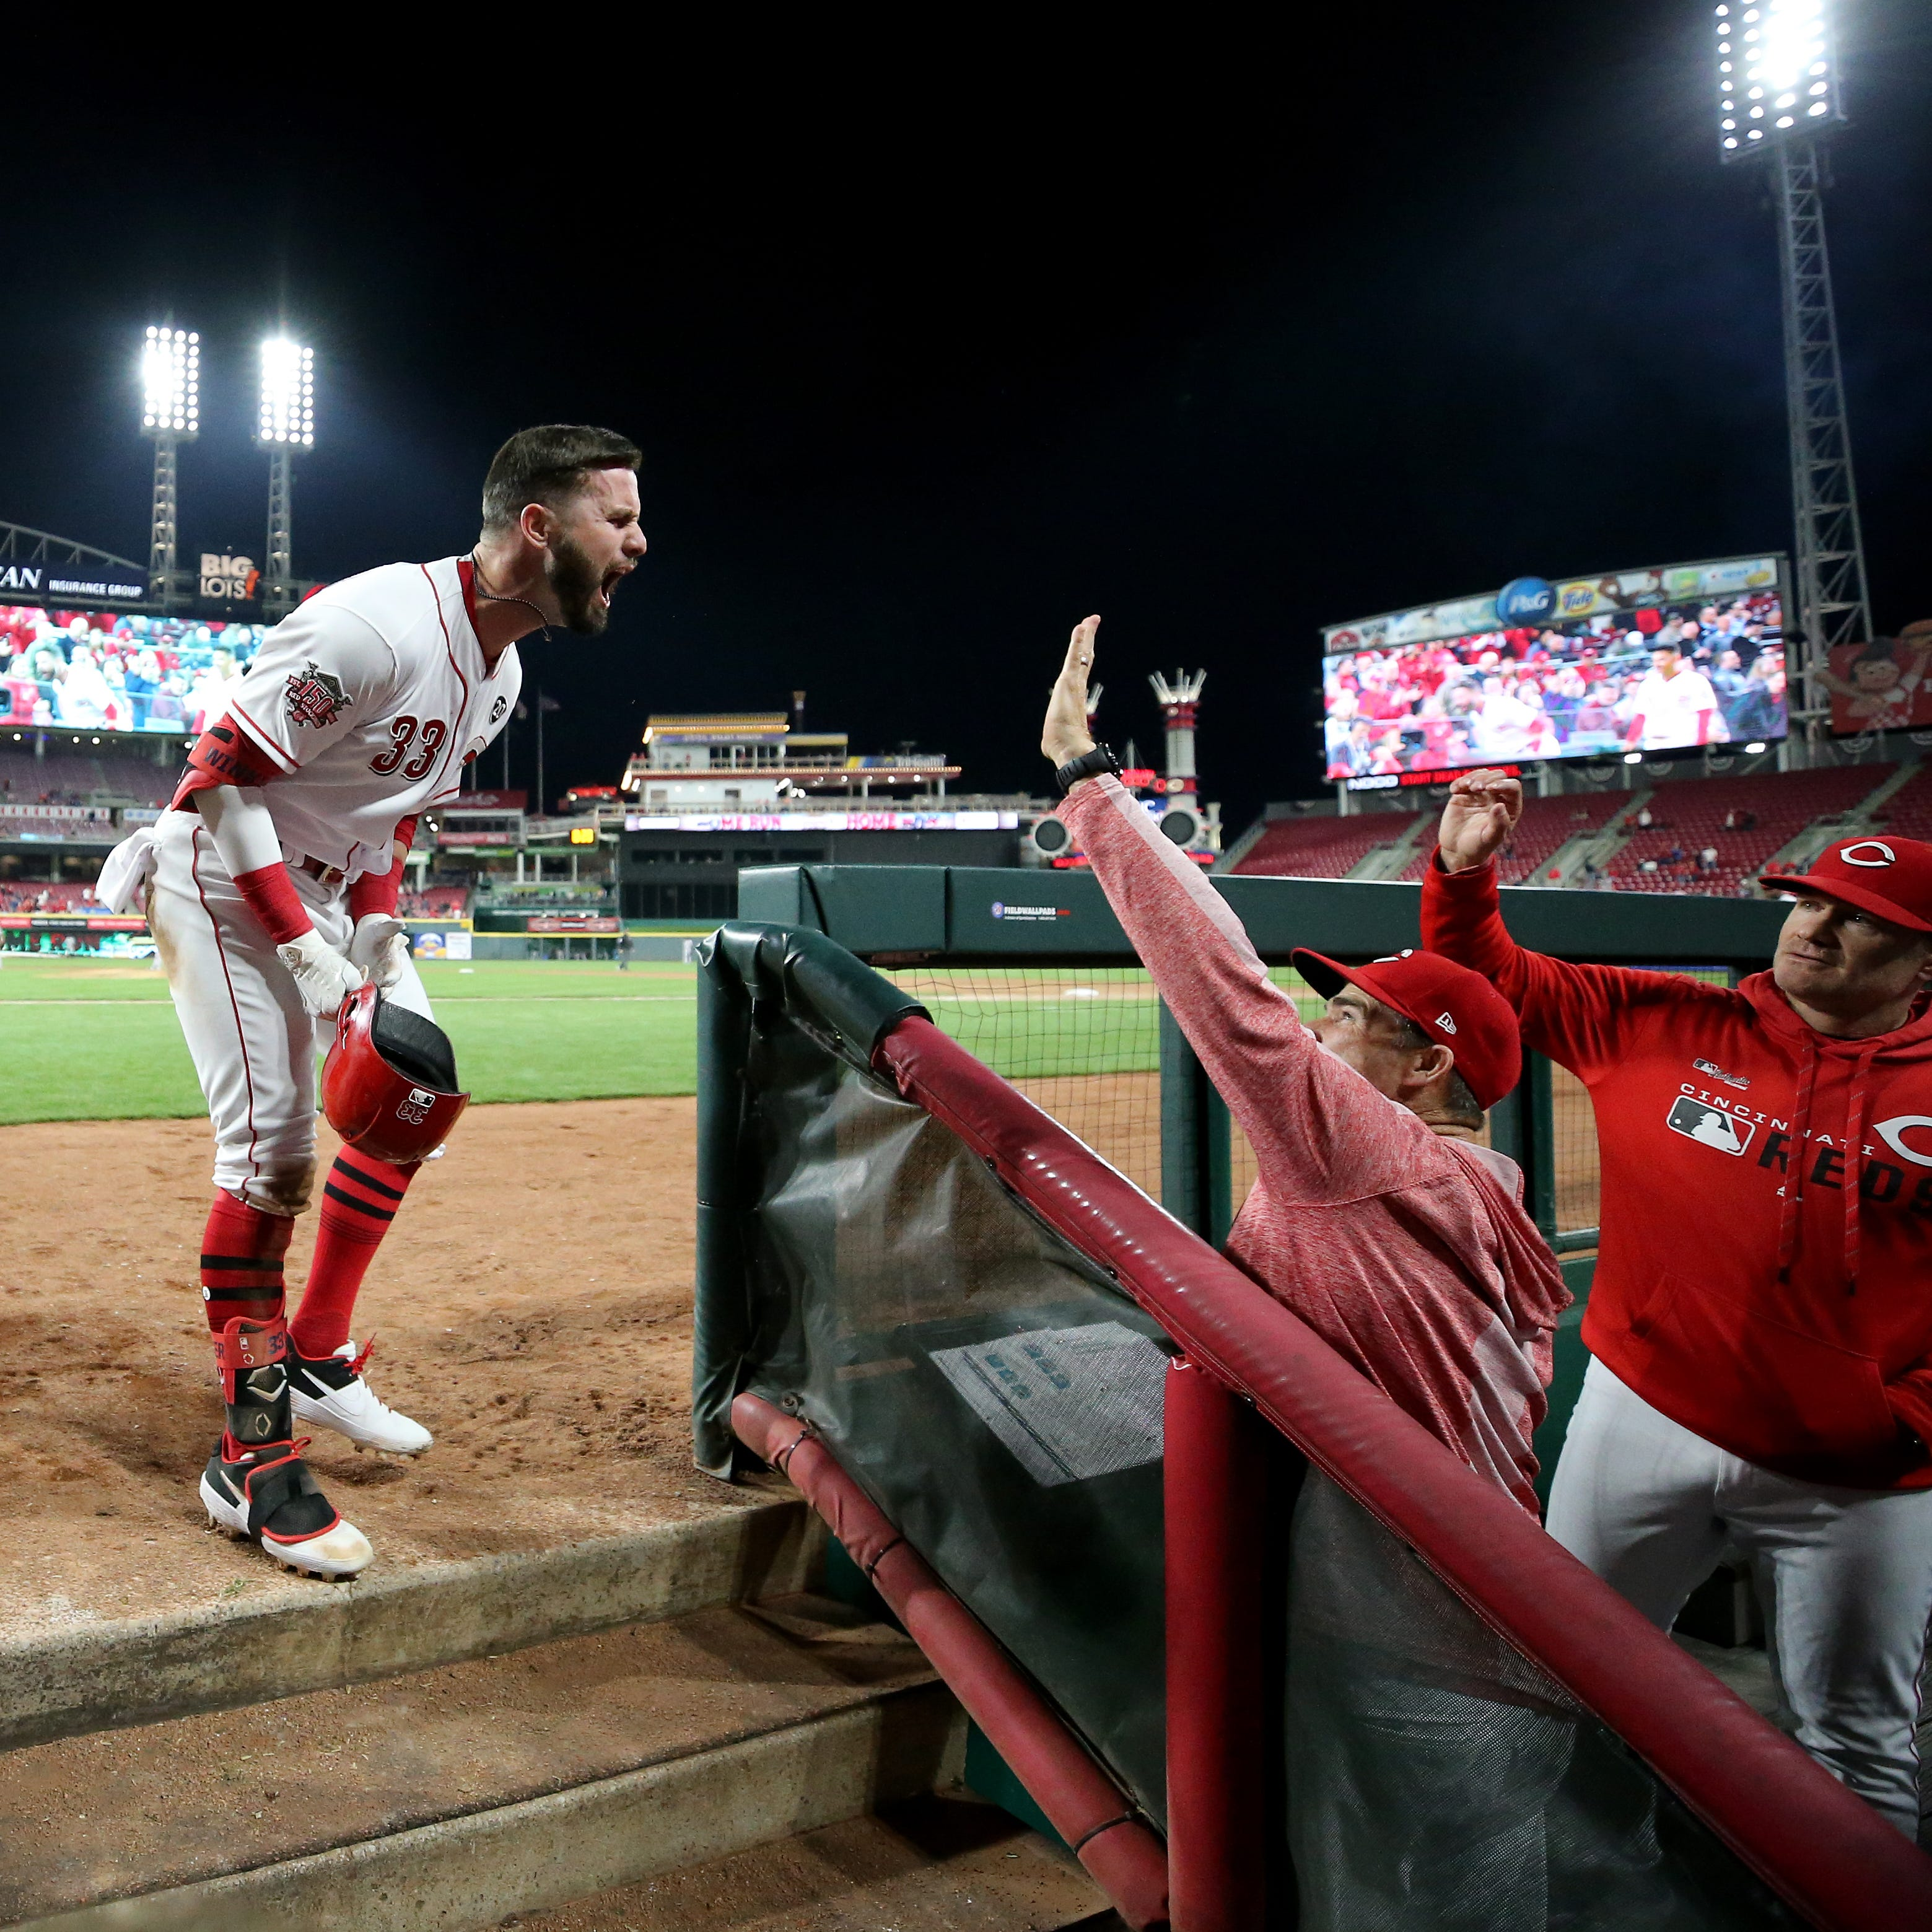 José Iglesias and Jesse Winker power Cincinnati Reds to 2-1 win against Miami Marlins